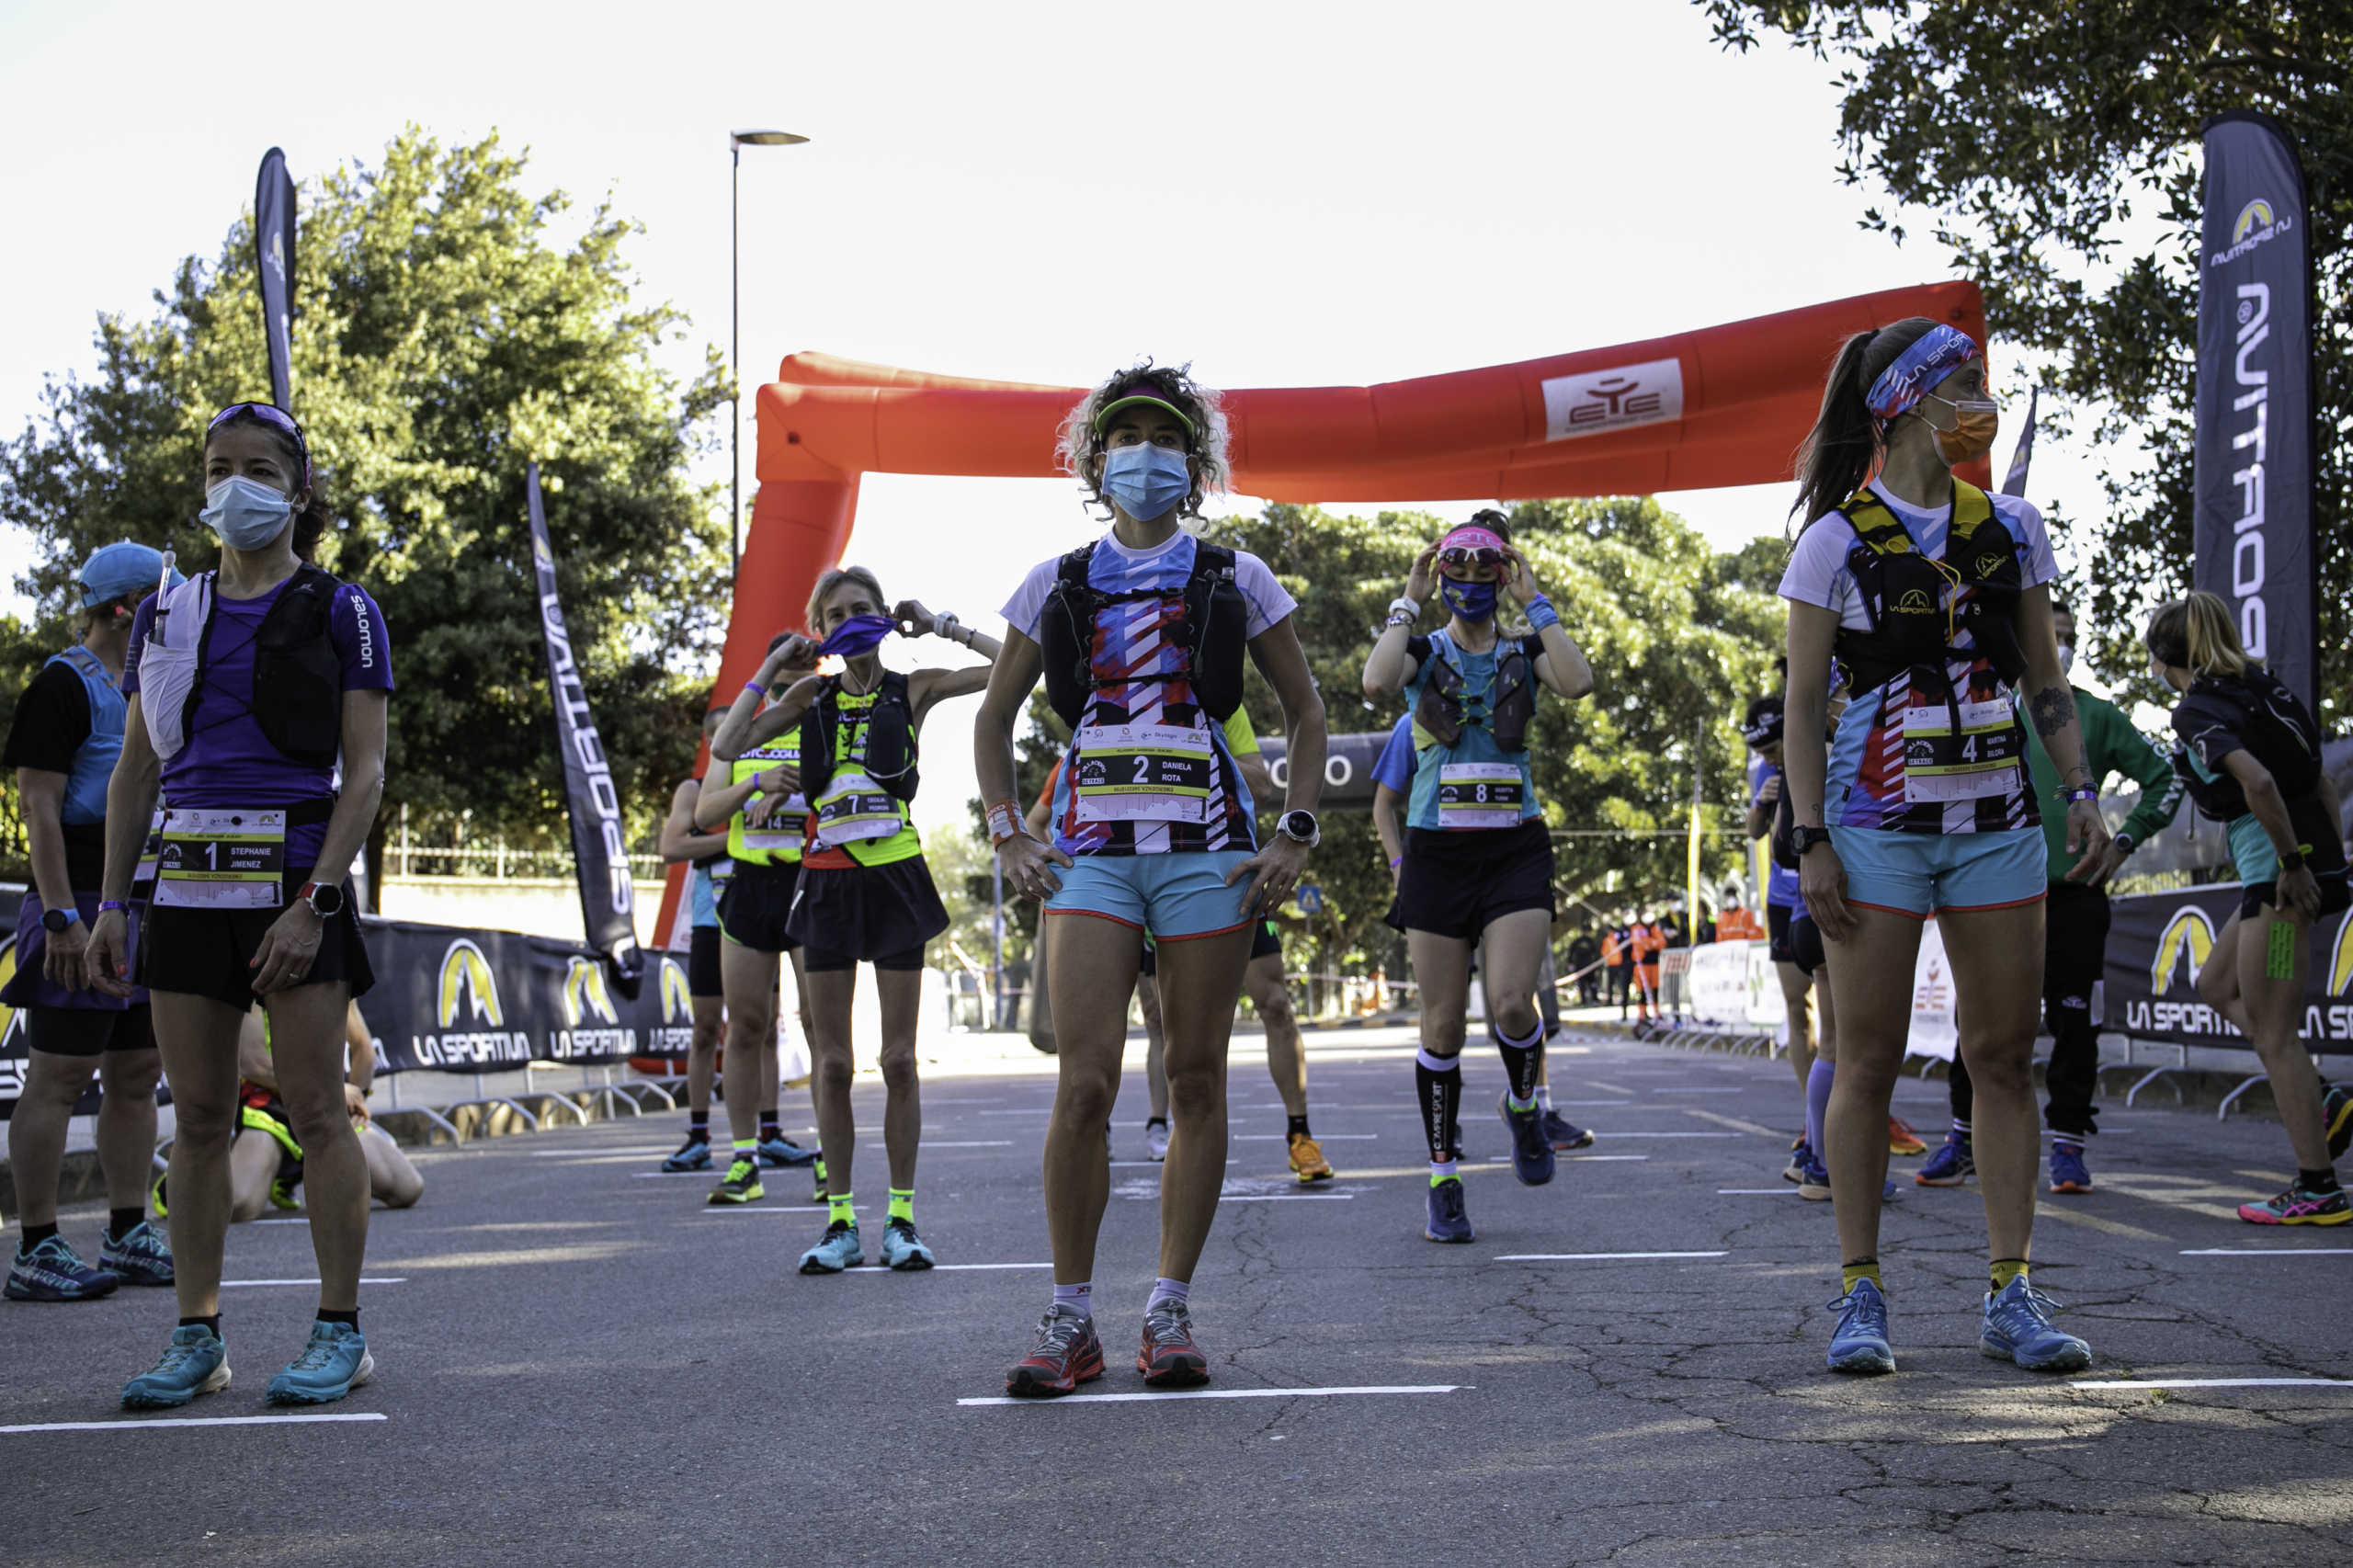 A destra, l'atleta del Gefo K Team di Olginate Martina Bilora (Ph credit Paolo Melis)